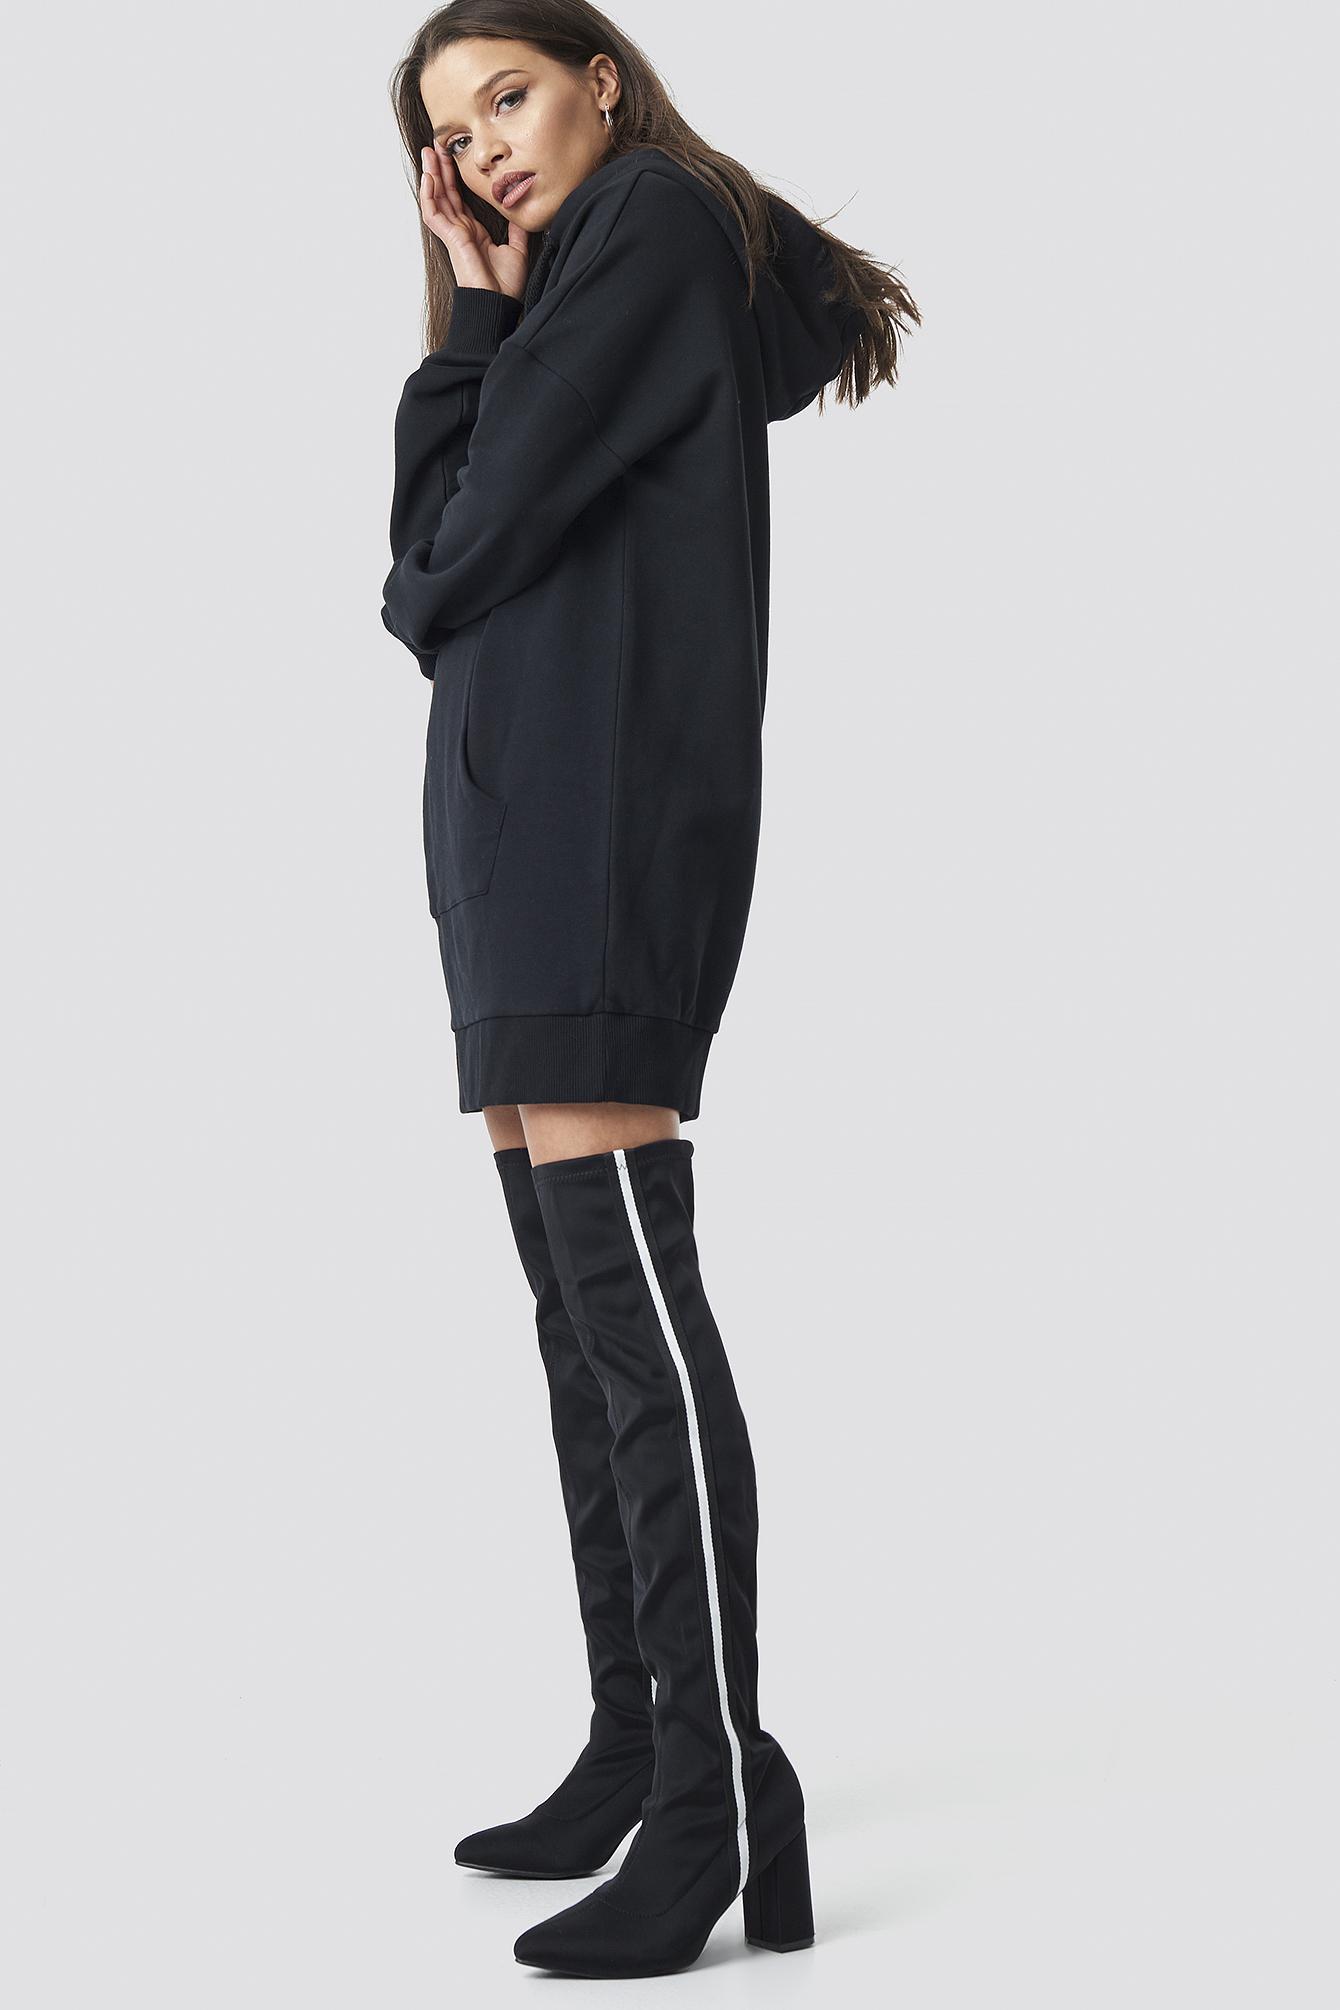 linn ahlborg x na-kd -  Striped Overknee Boots - Black